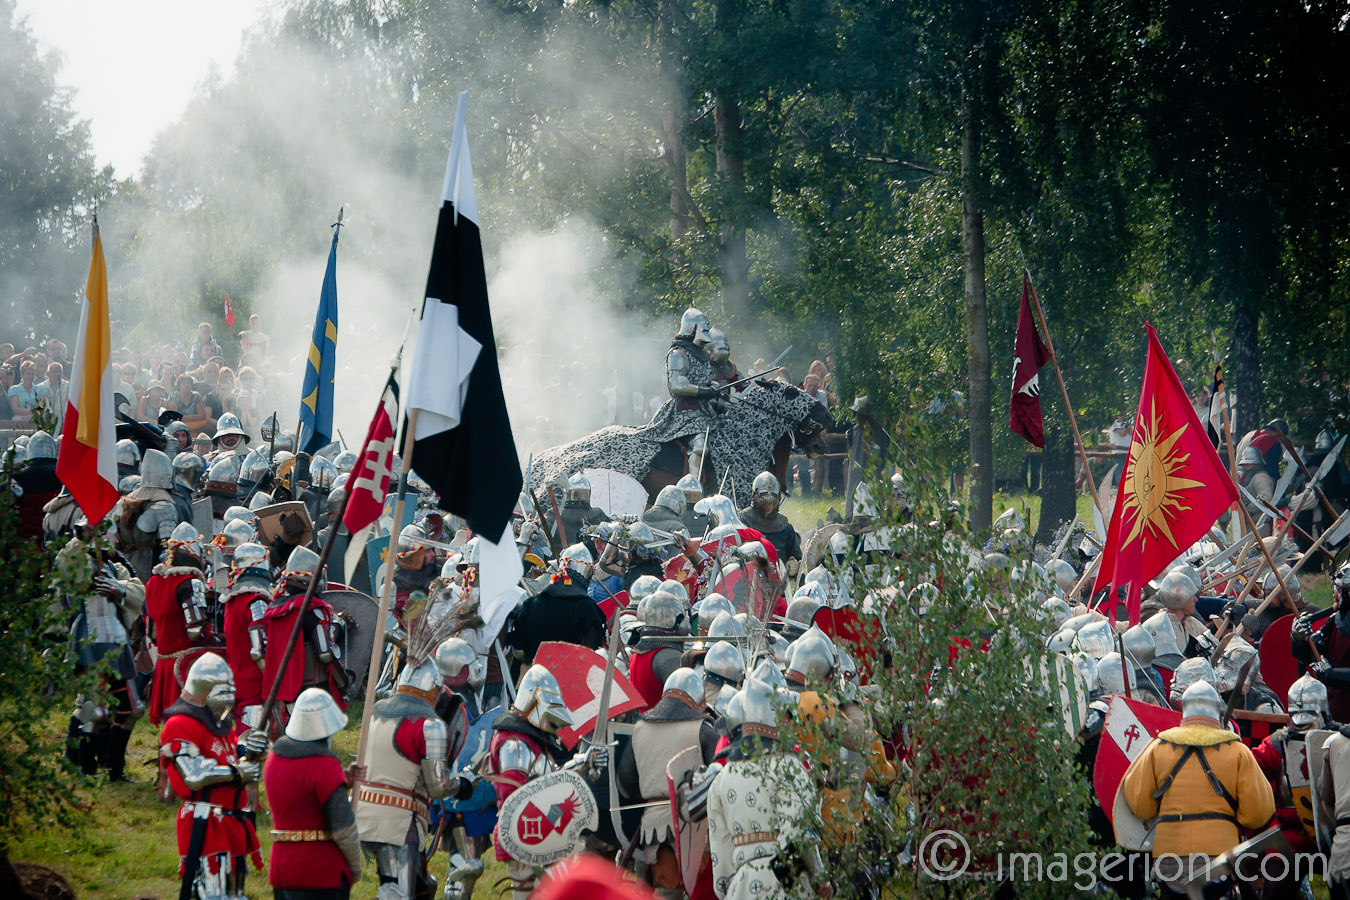 Medieval battlefield armies